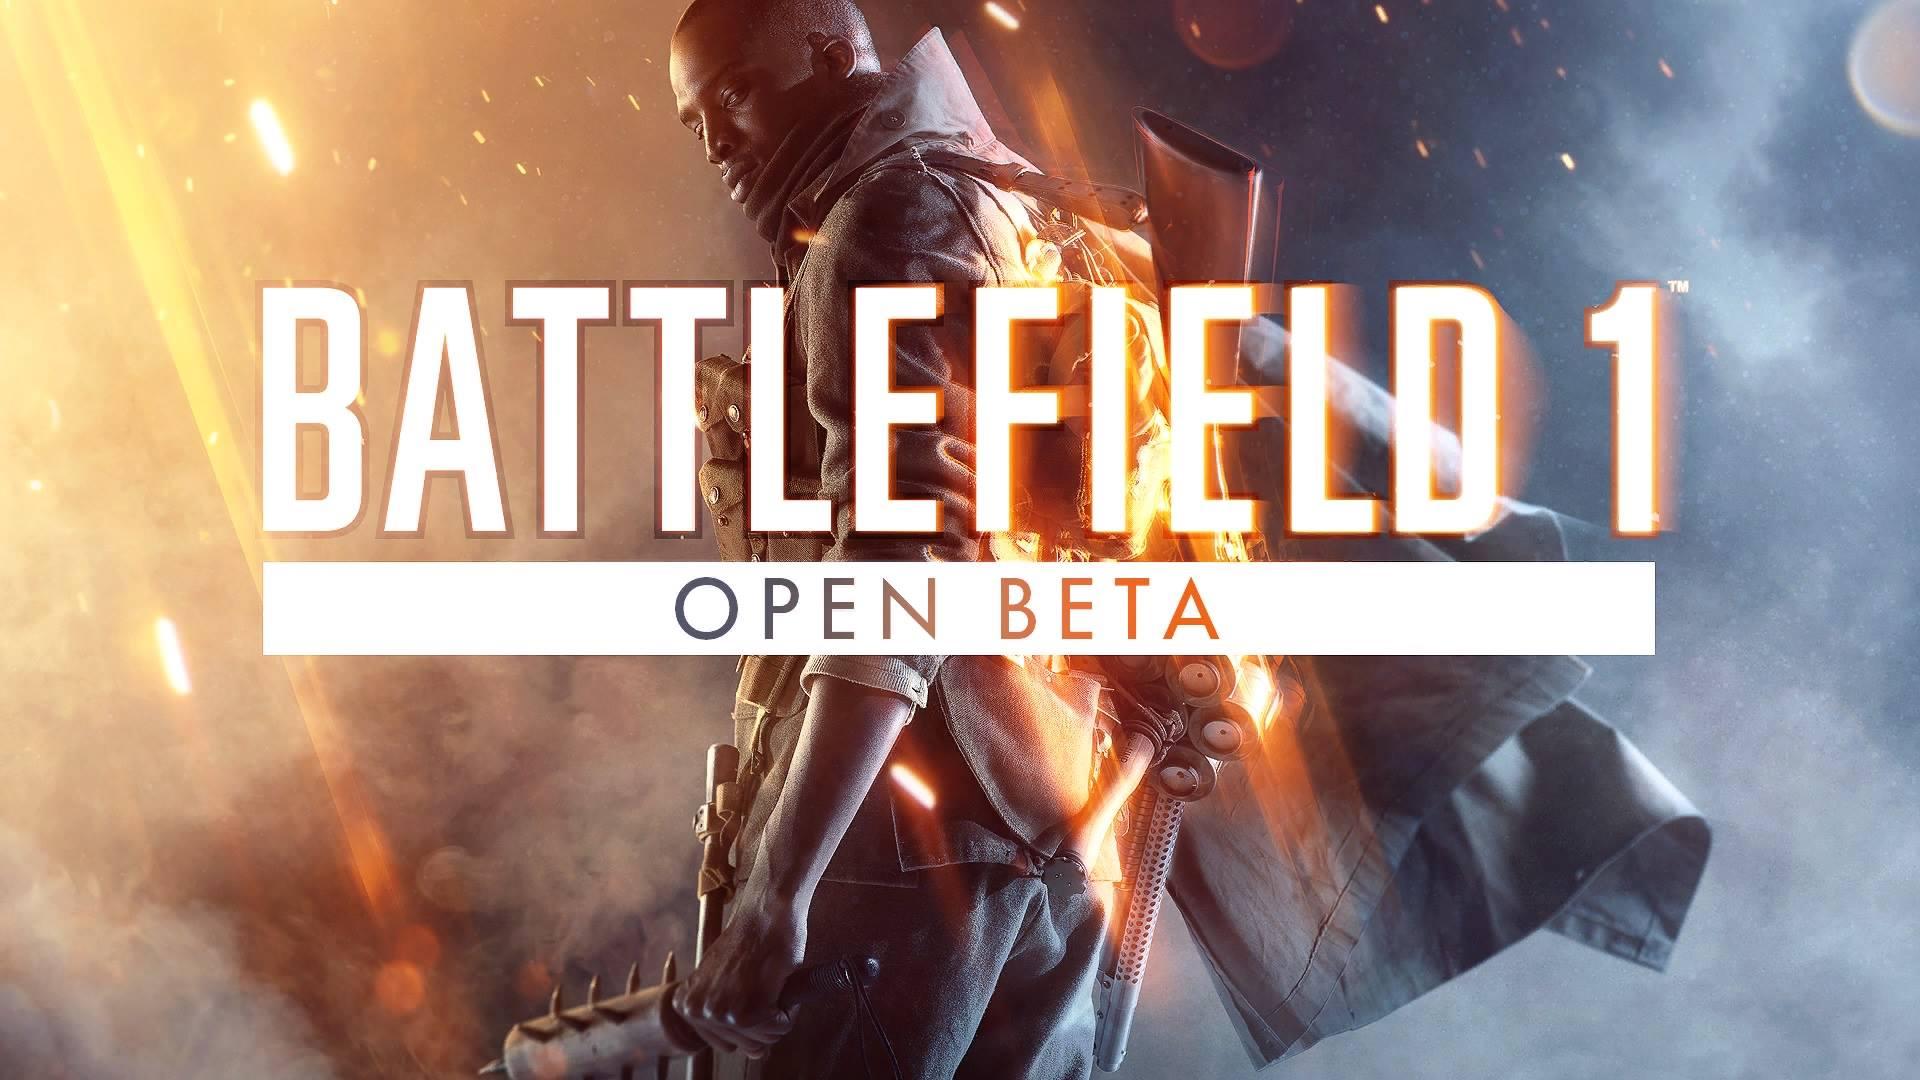 Battlefield 1Beta